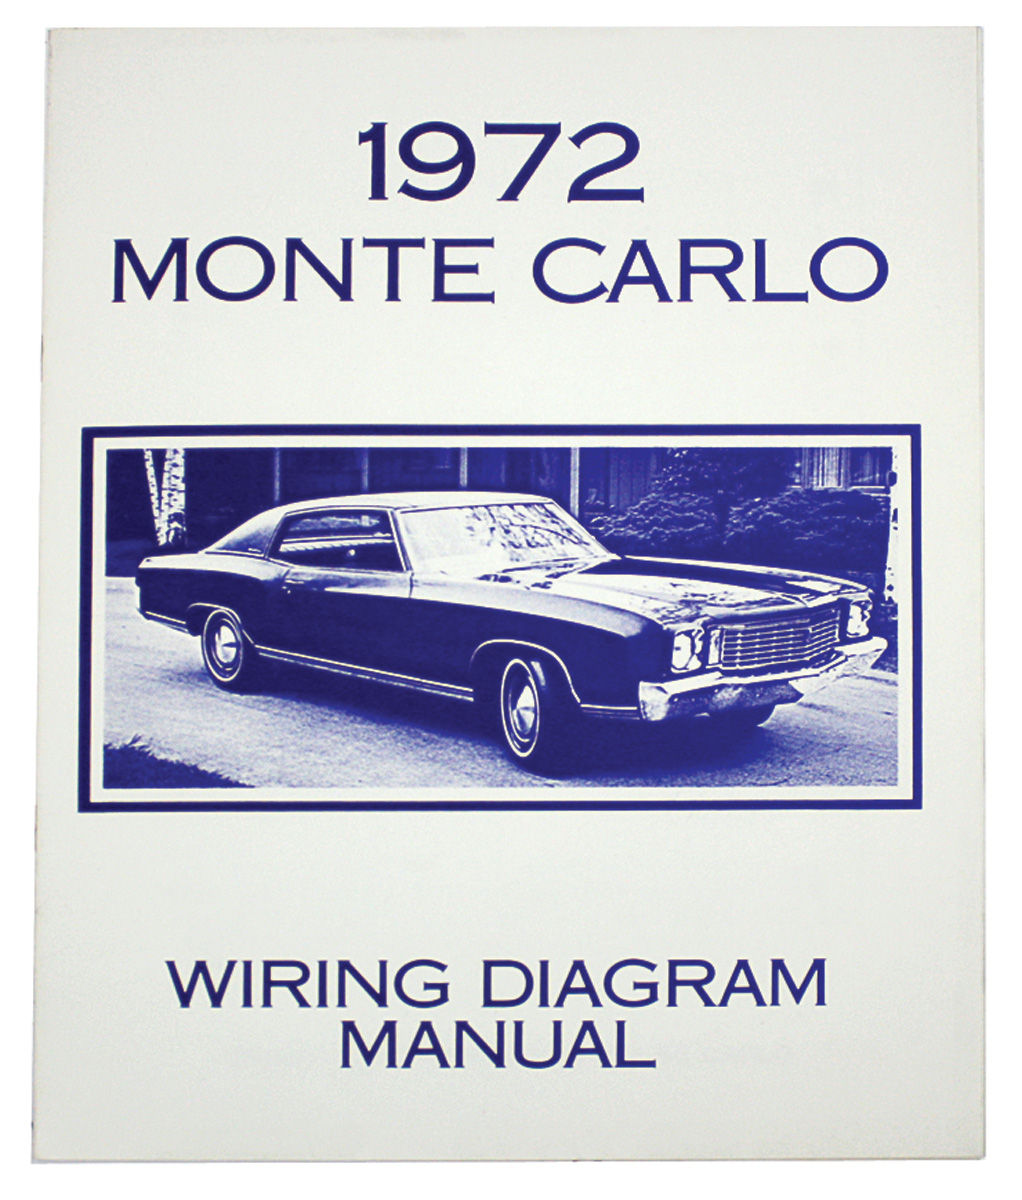 monte carlo wiring diagram manuals opgi com rh opgi com 1972 chevy blazer wiring diagram 1996 chevy monte carlo [ 1022 x 1200 Pixel ]